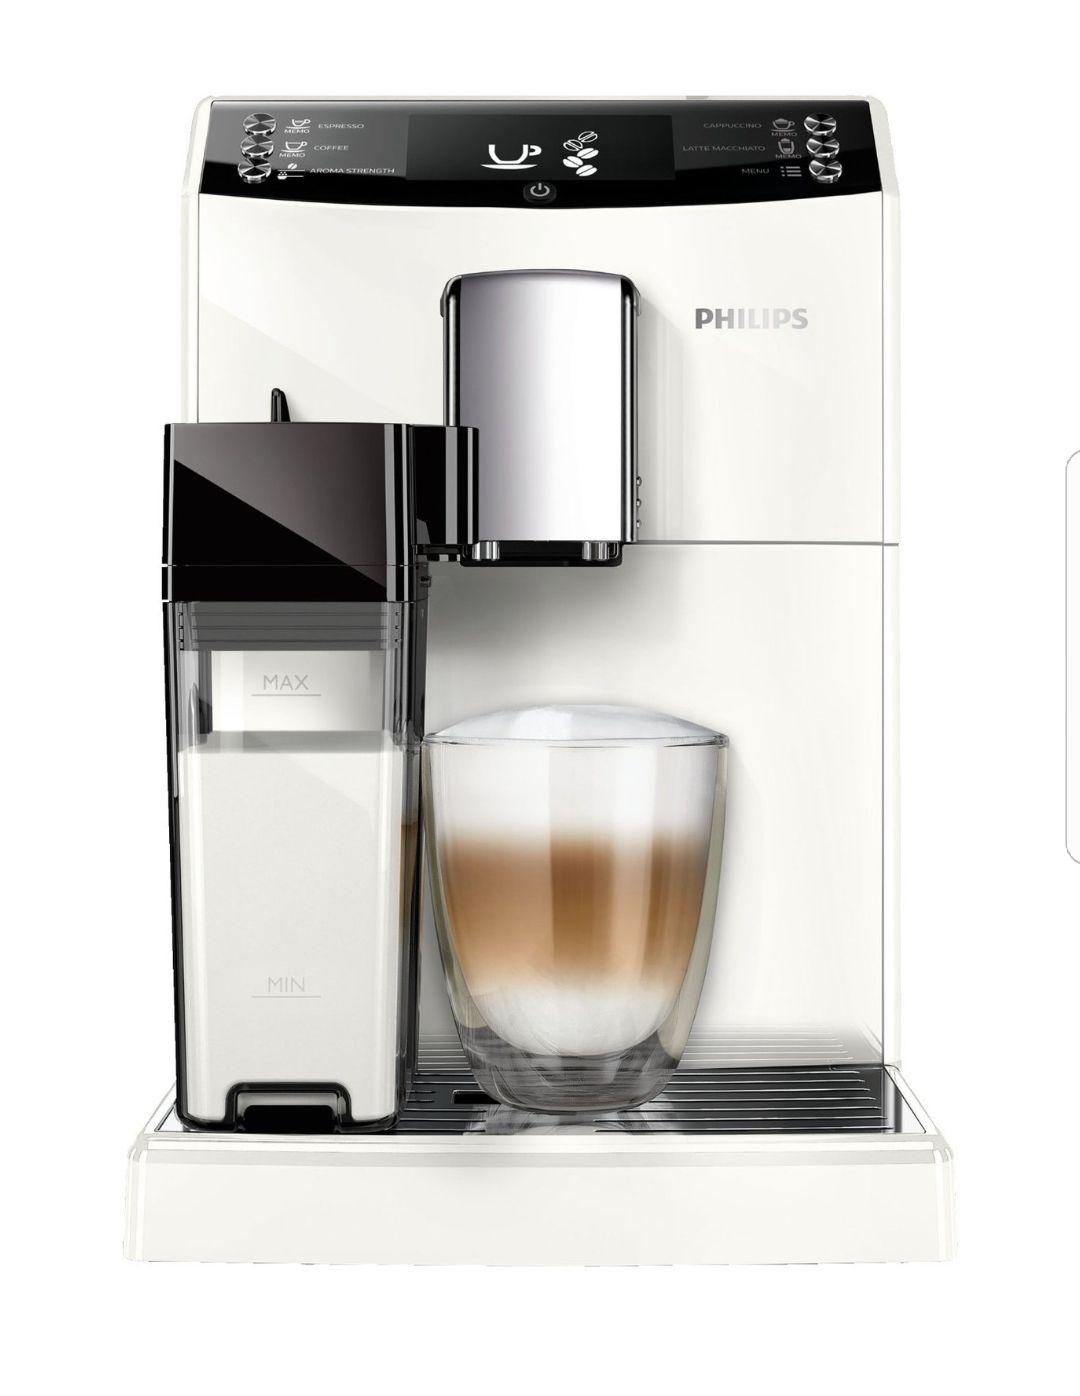 Philips EP3362/00 + 70€ Geschenkset gratis (Kaffee-Vollautomat)